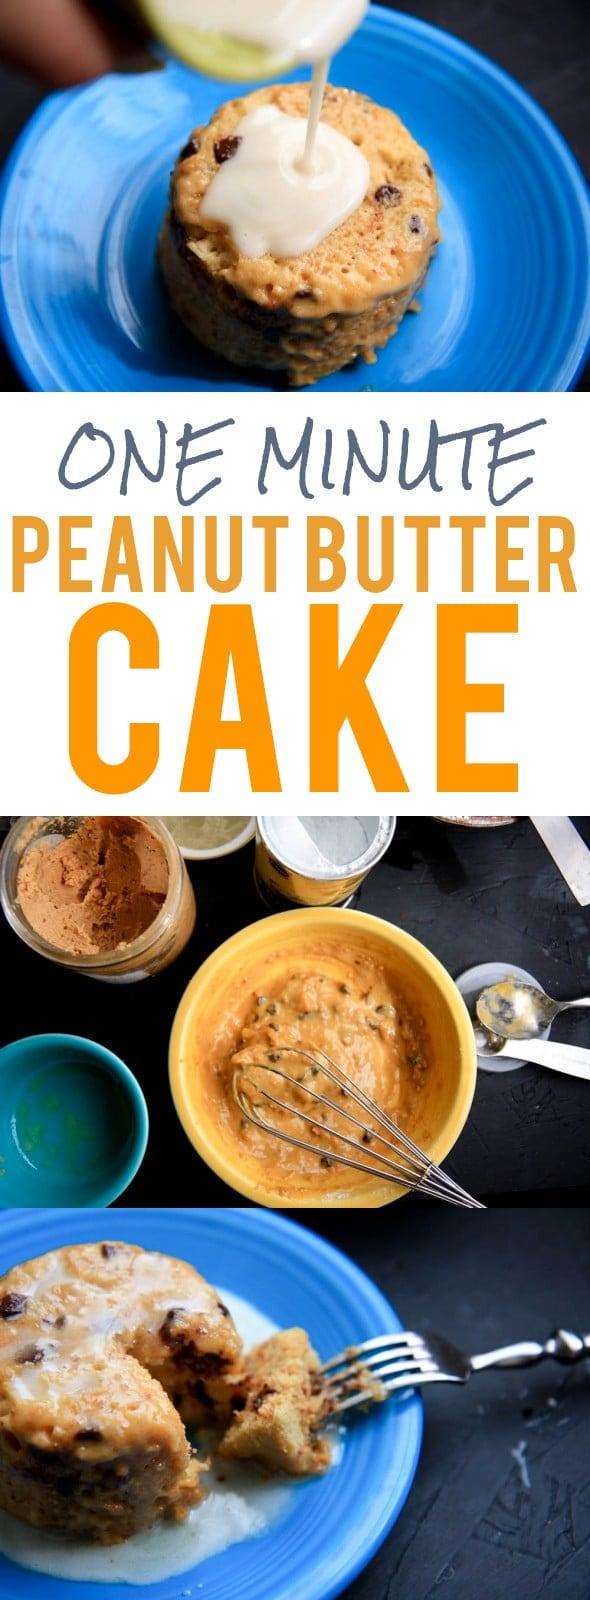 One Minute Peanut Butter Cake